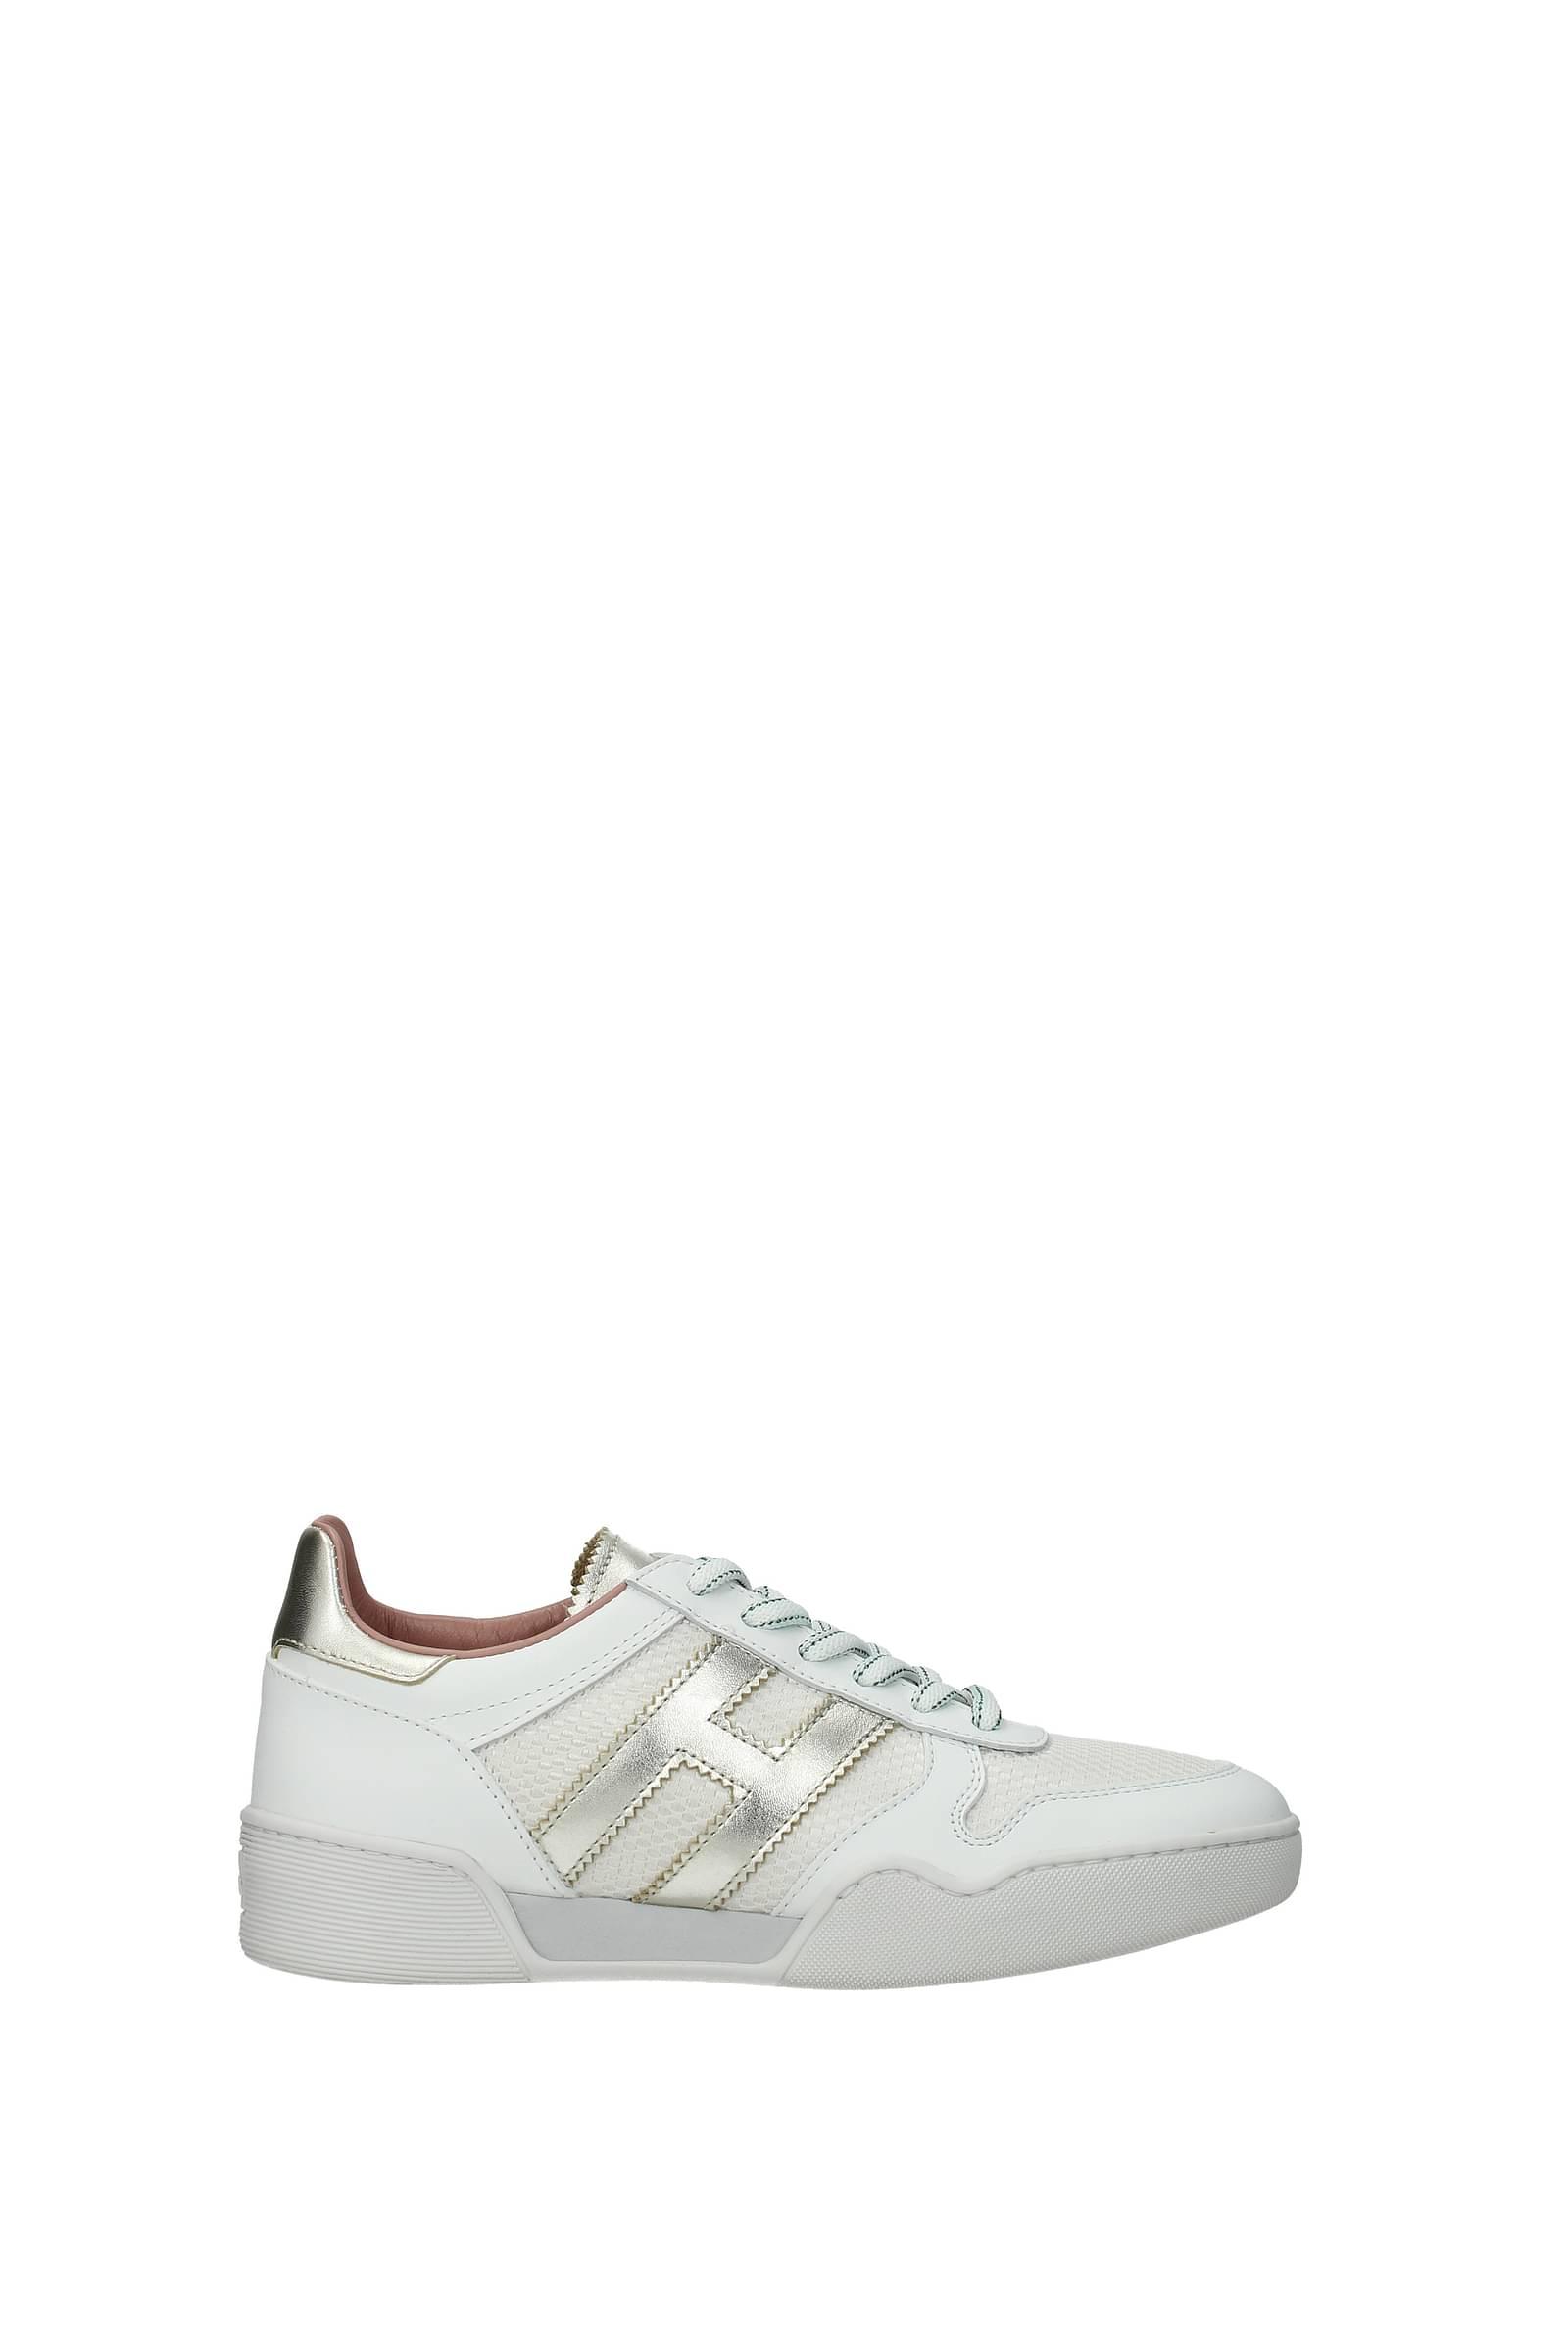 Hogan Sneakers h357 Donna Pelle Bianco Platino